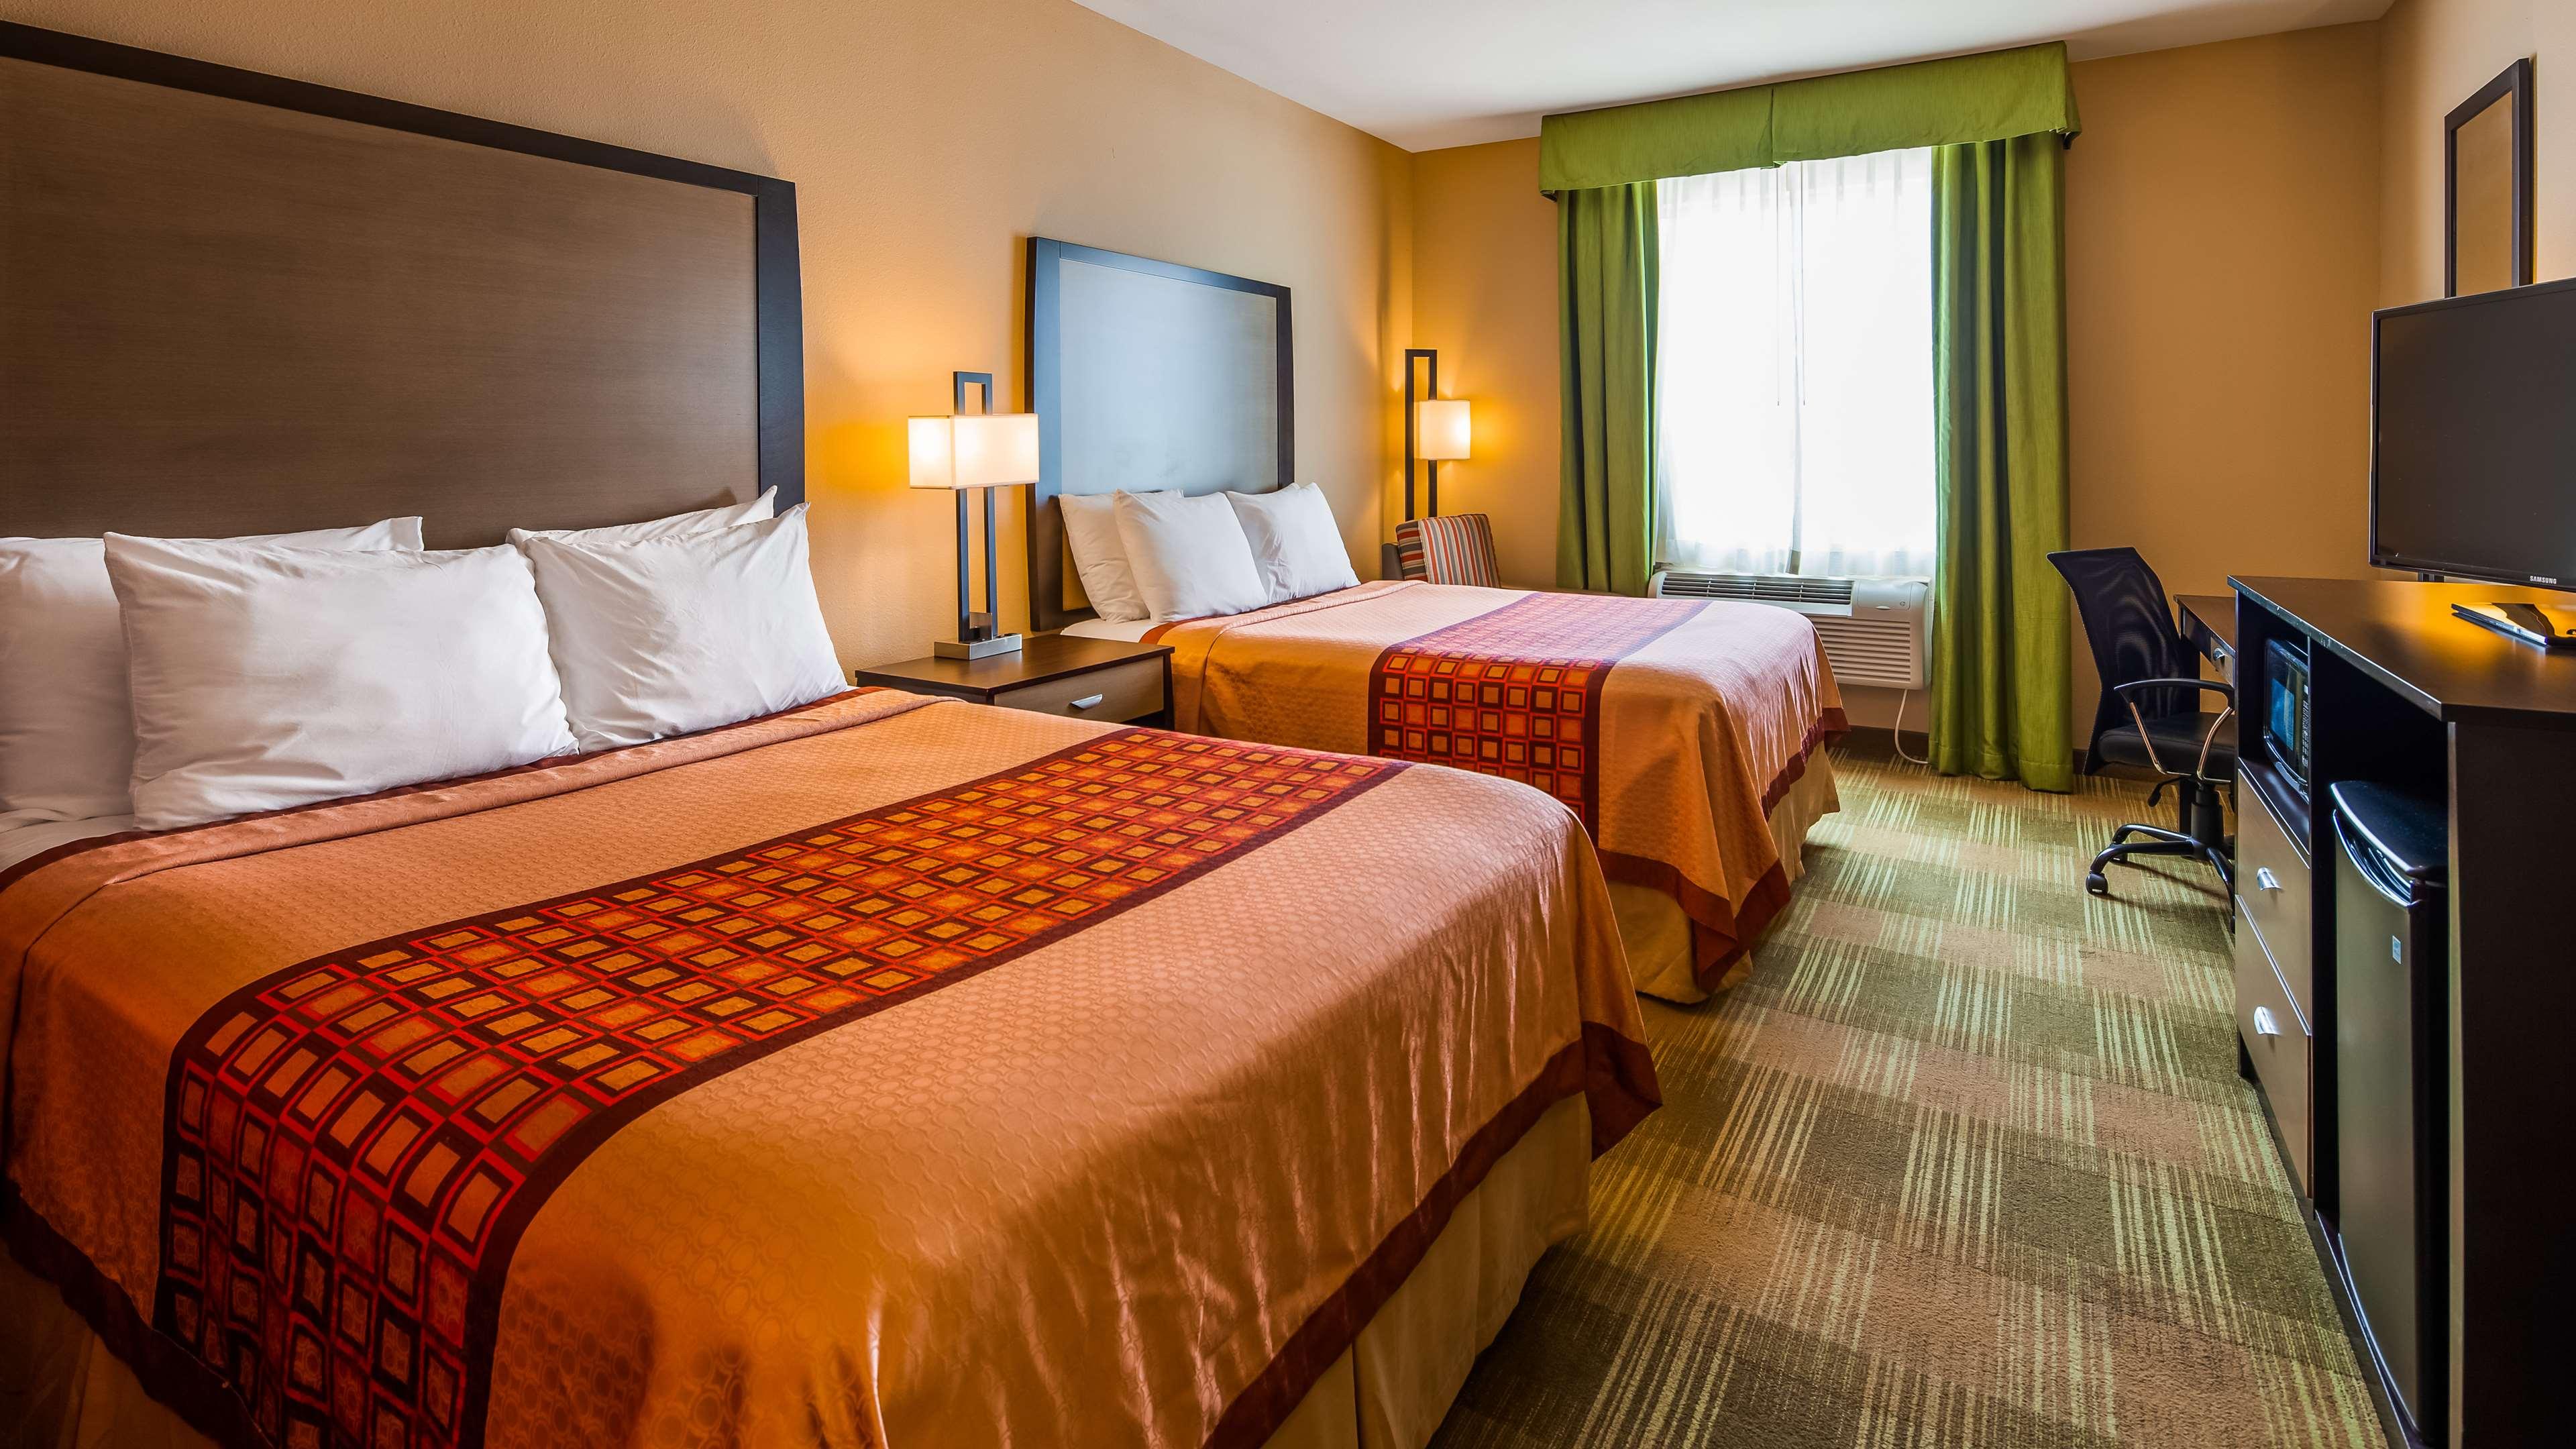 SureStay Hotel by Best Western Cotulla image 13